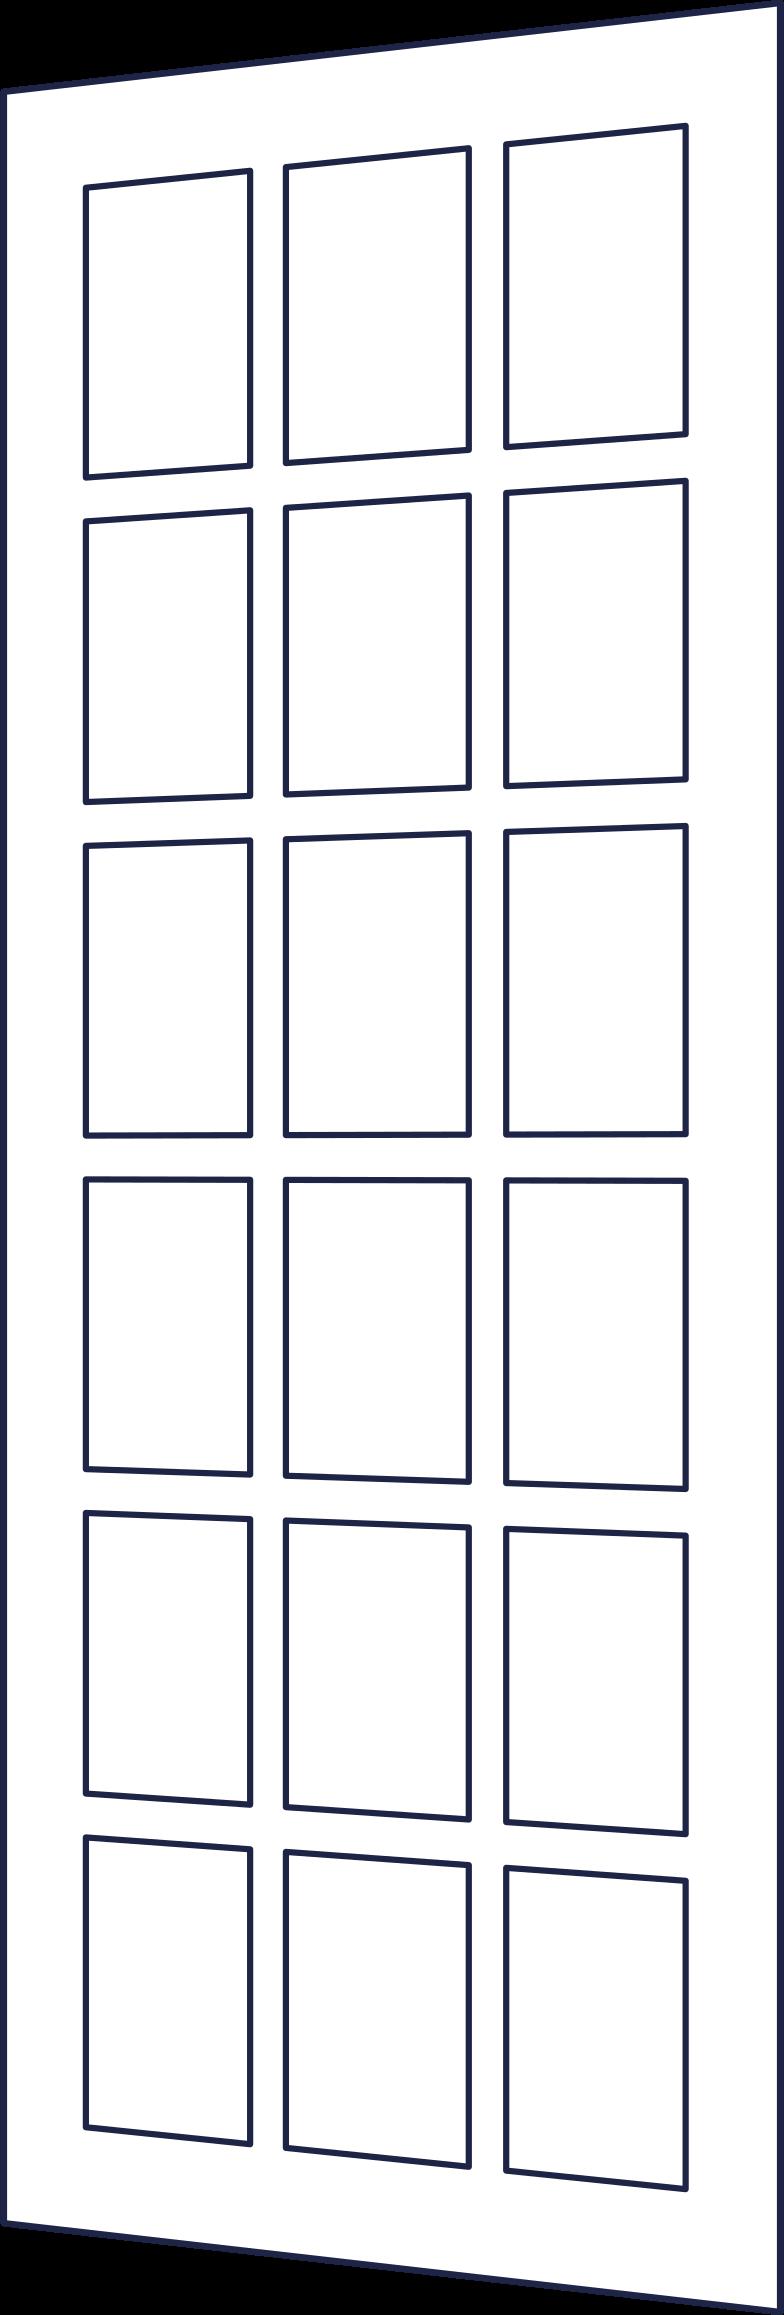 welcome  door 2 line Clipart illustration in PNG, SVG